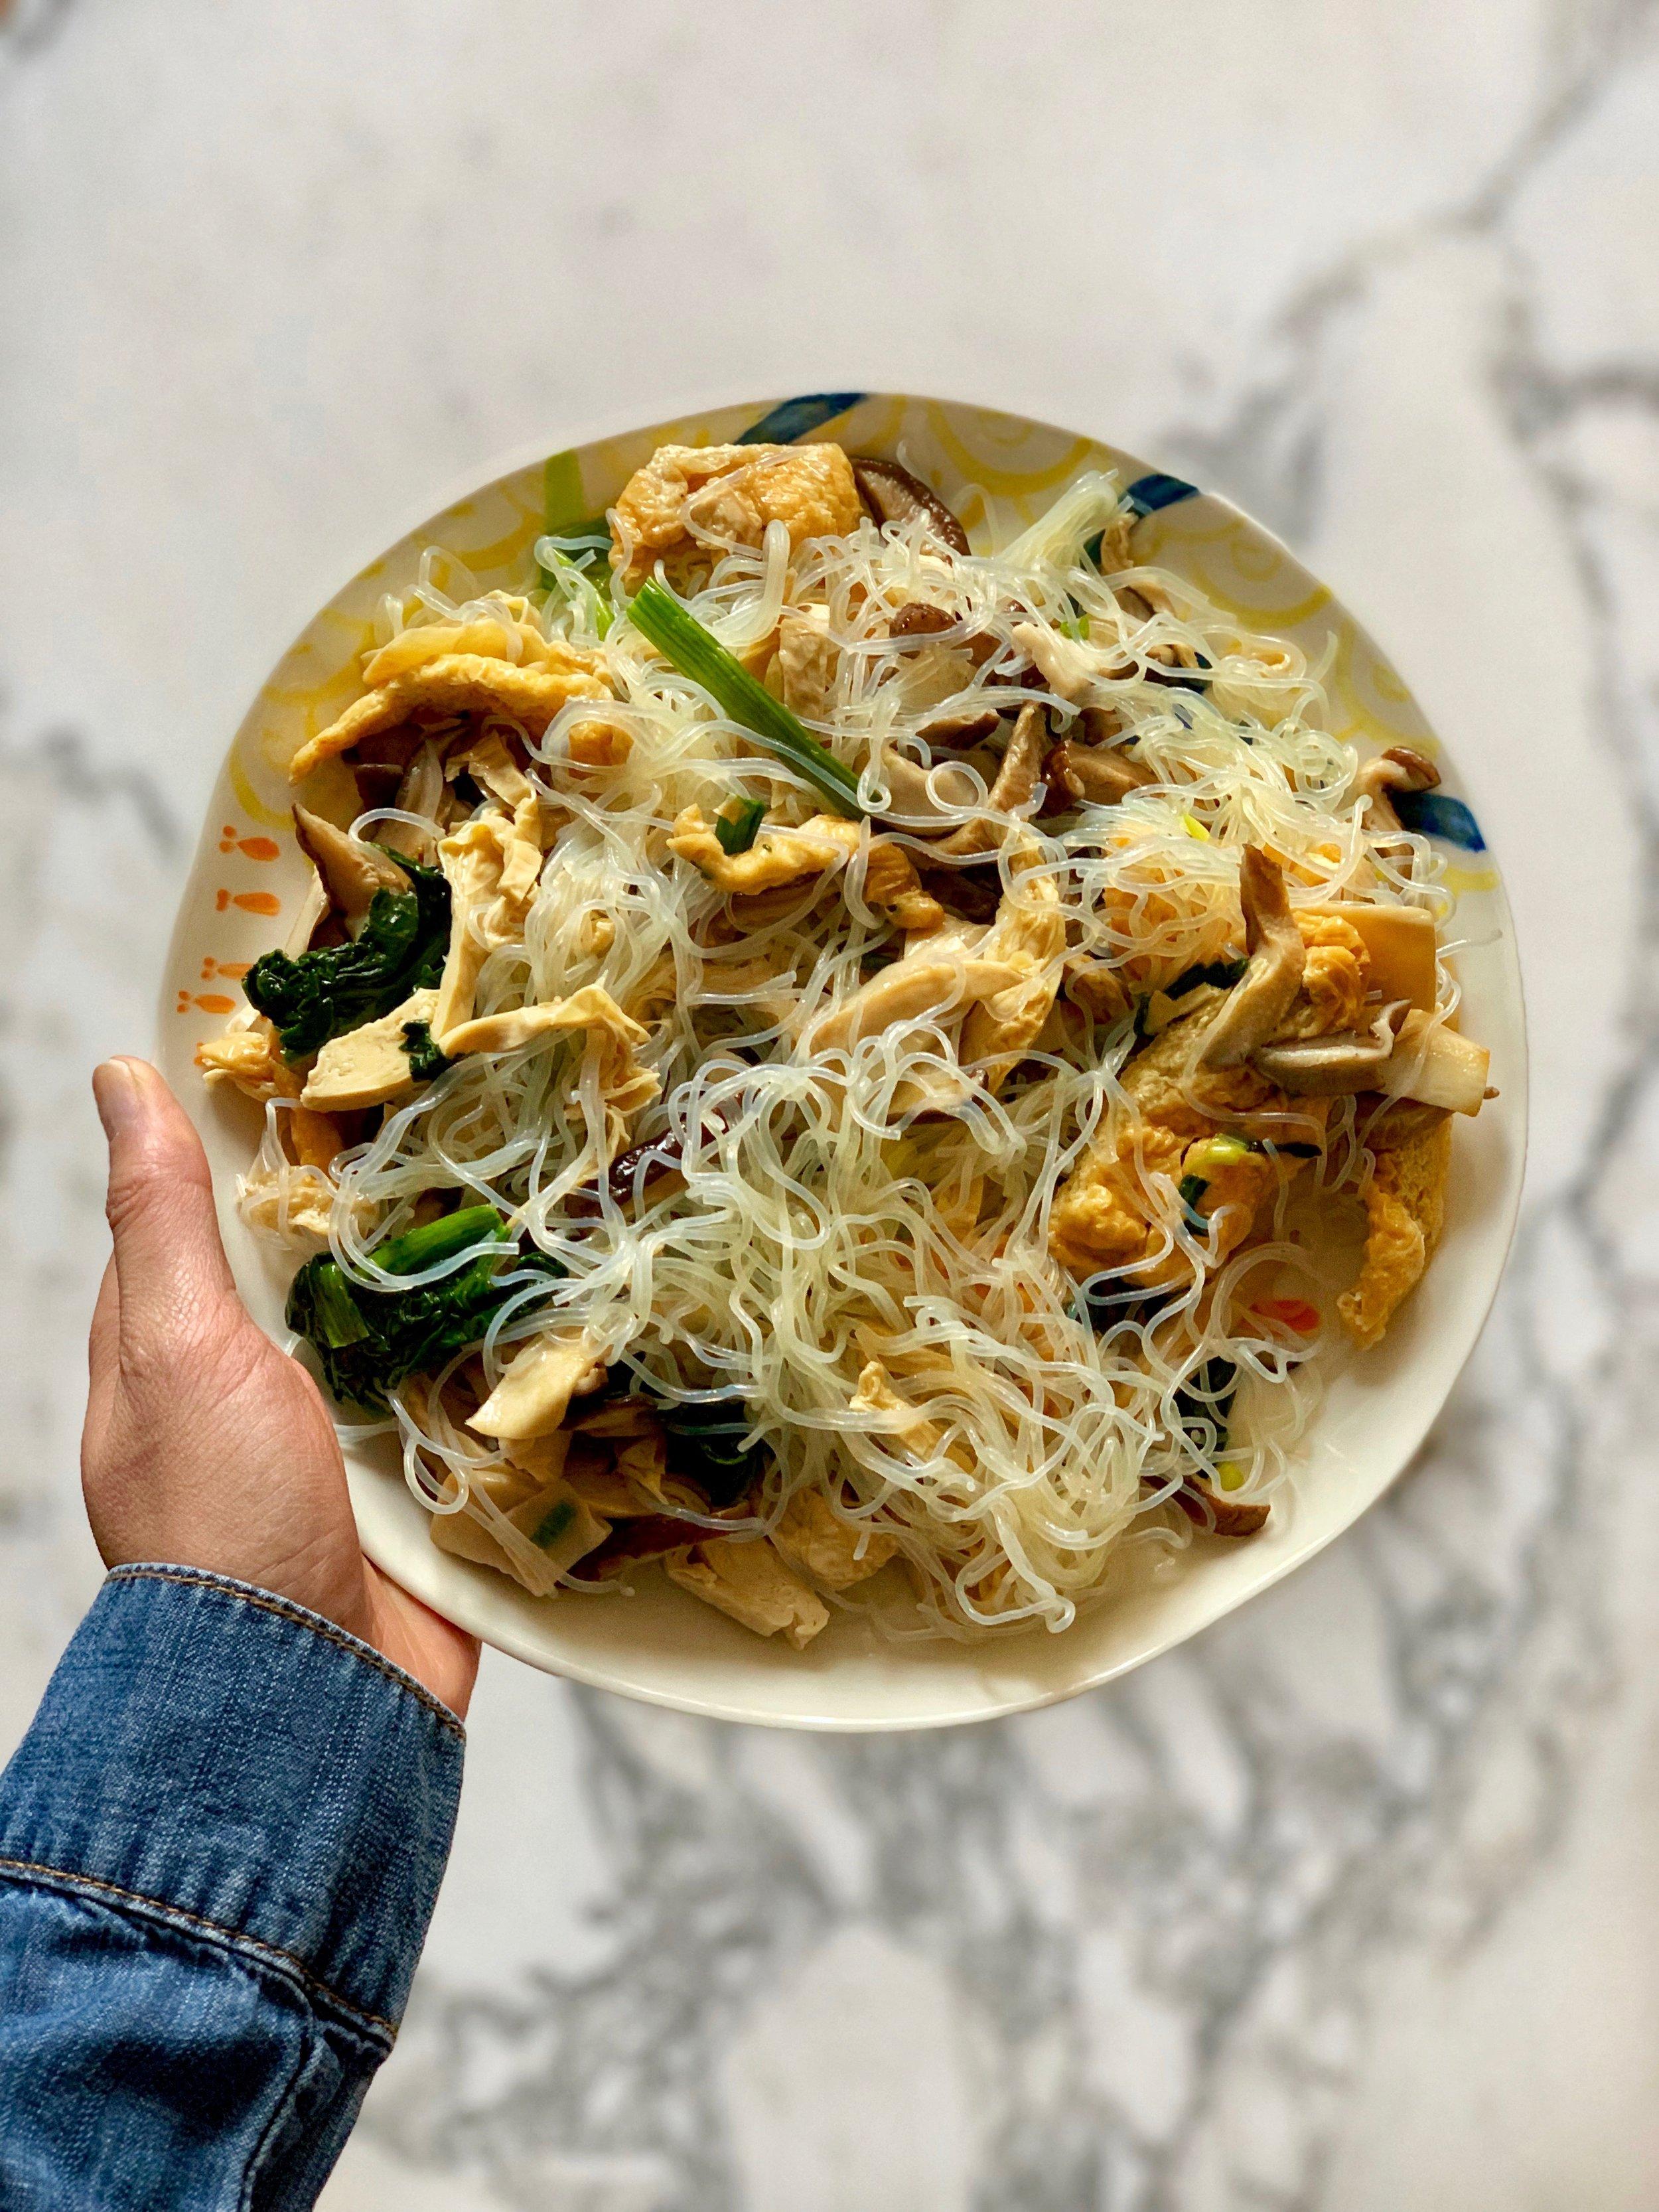 Vegan stir-fried cellophane noodles recipe. Vegan japchae recipe. Mung bean noodles recipe. By Stacy K. Leung, nutritionist